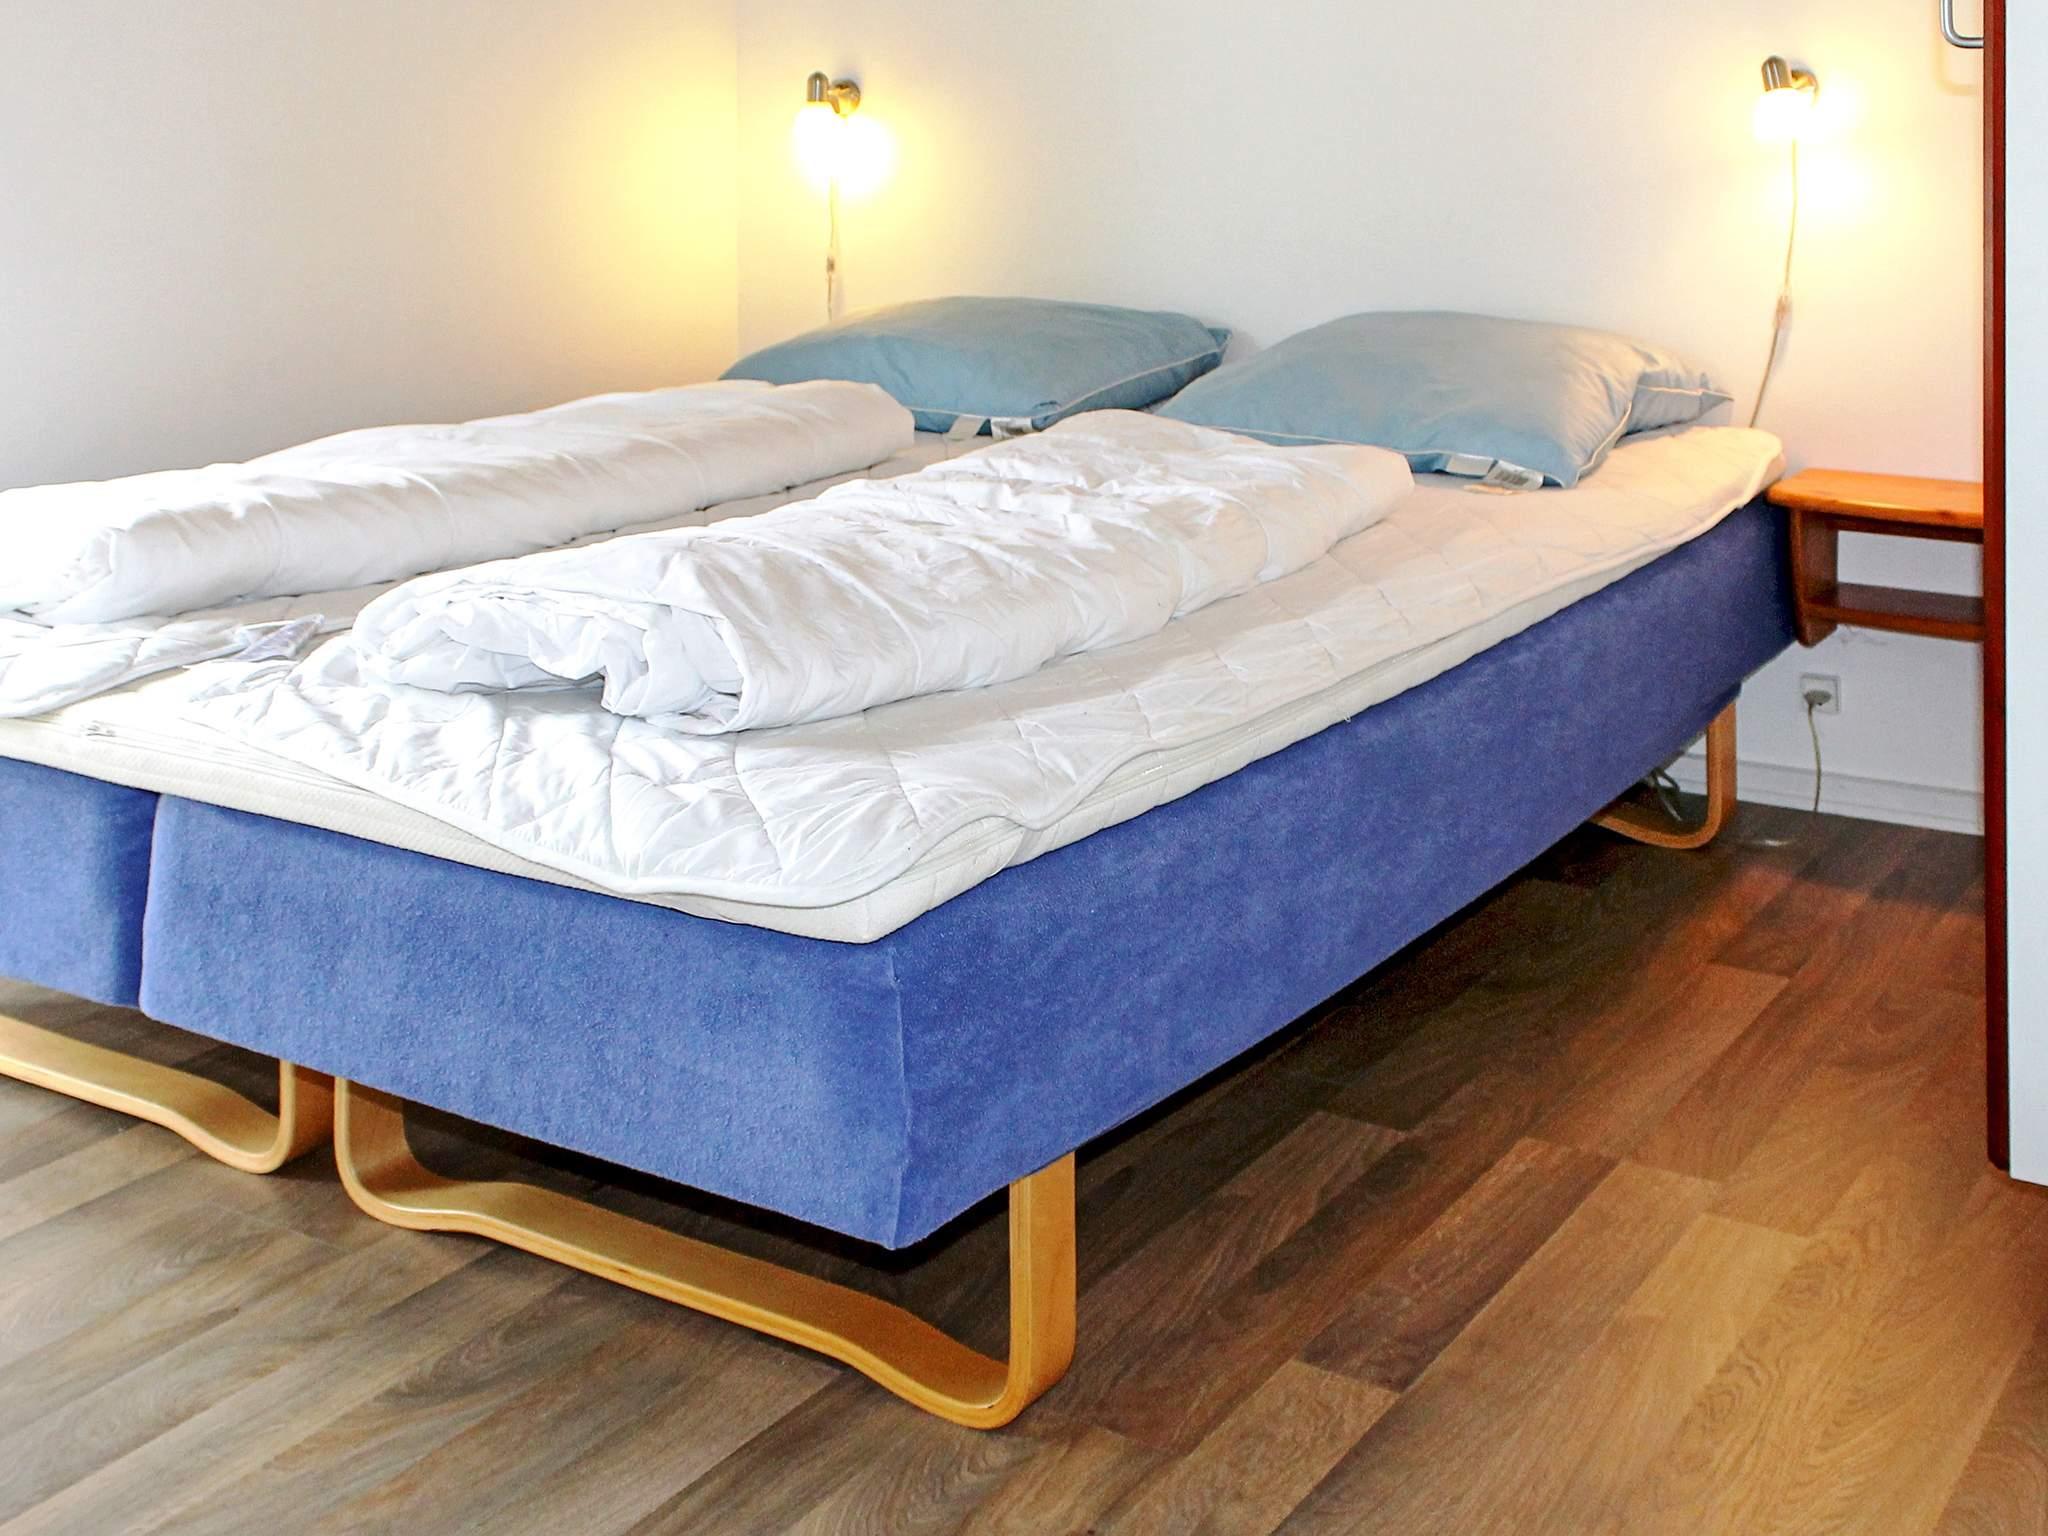 Ferienhaus Hasle (241698), Hasle, , Bornholm, Dänemark, Bild 10